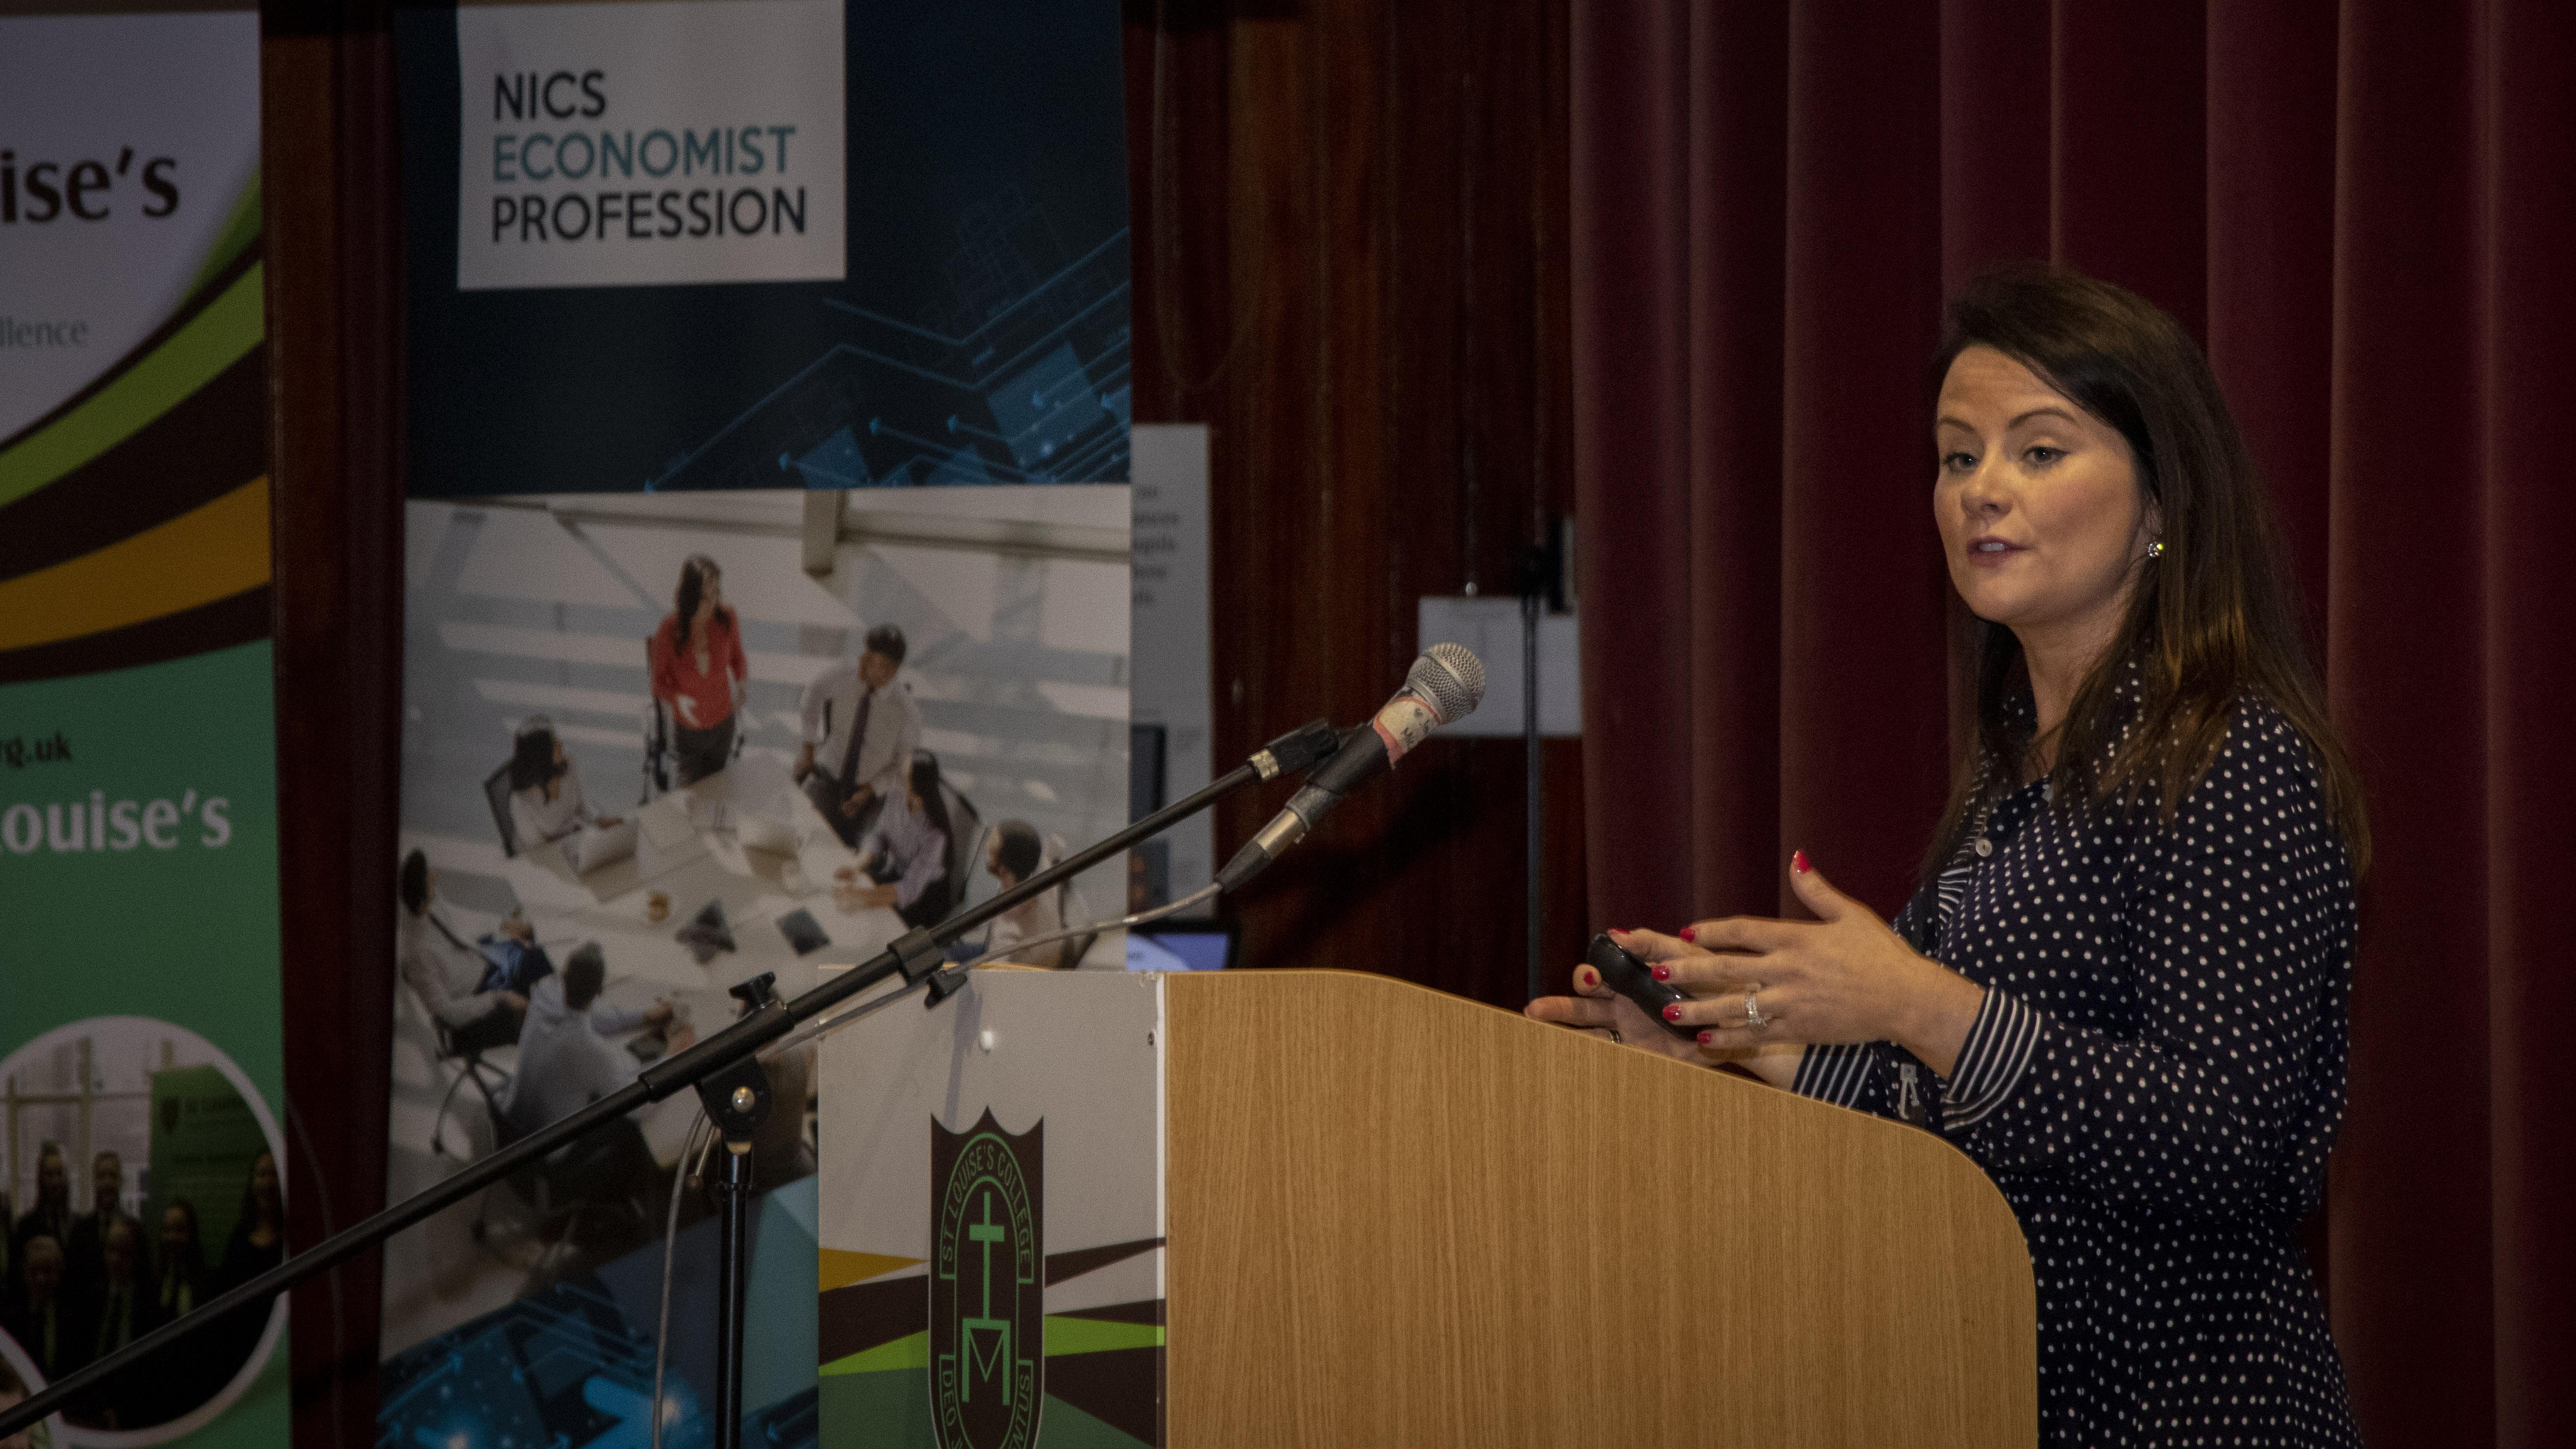 Ulster University school conference inspires next generation of economists